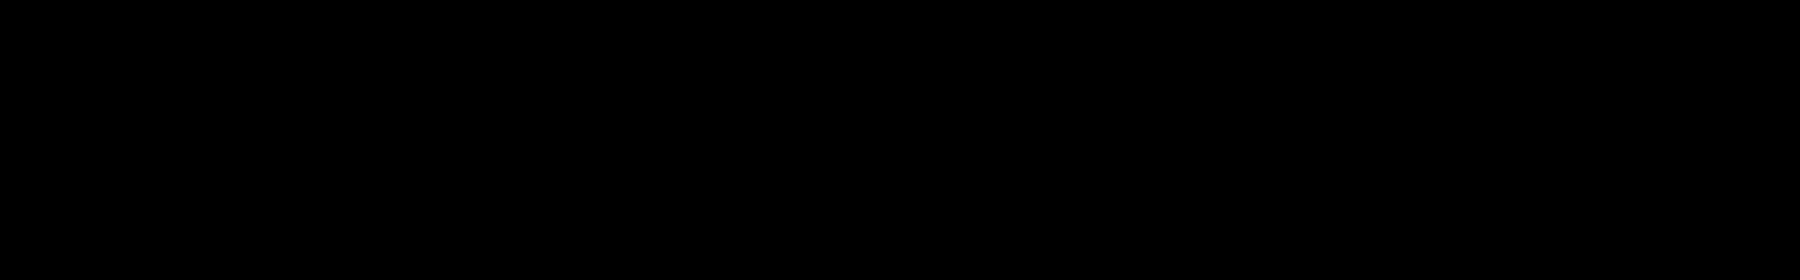 Dawn audio waveform